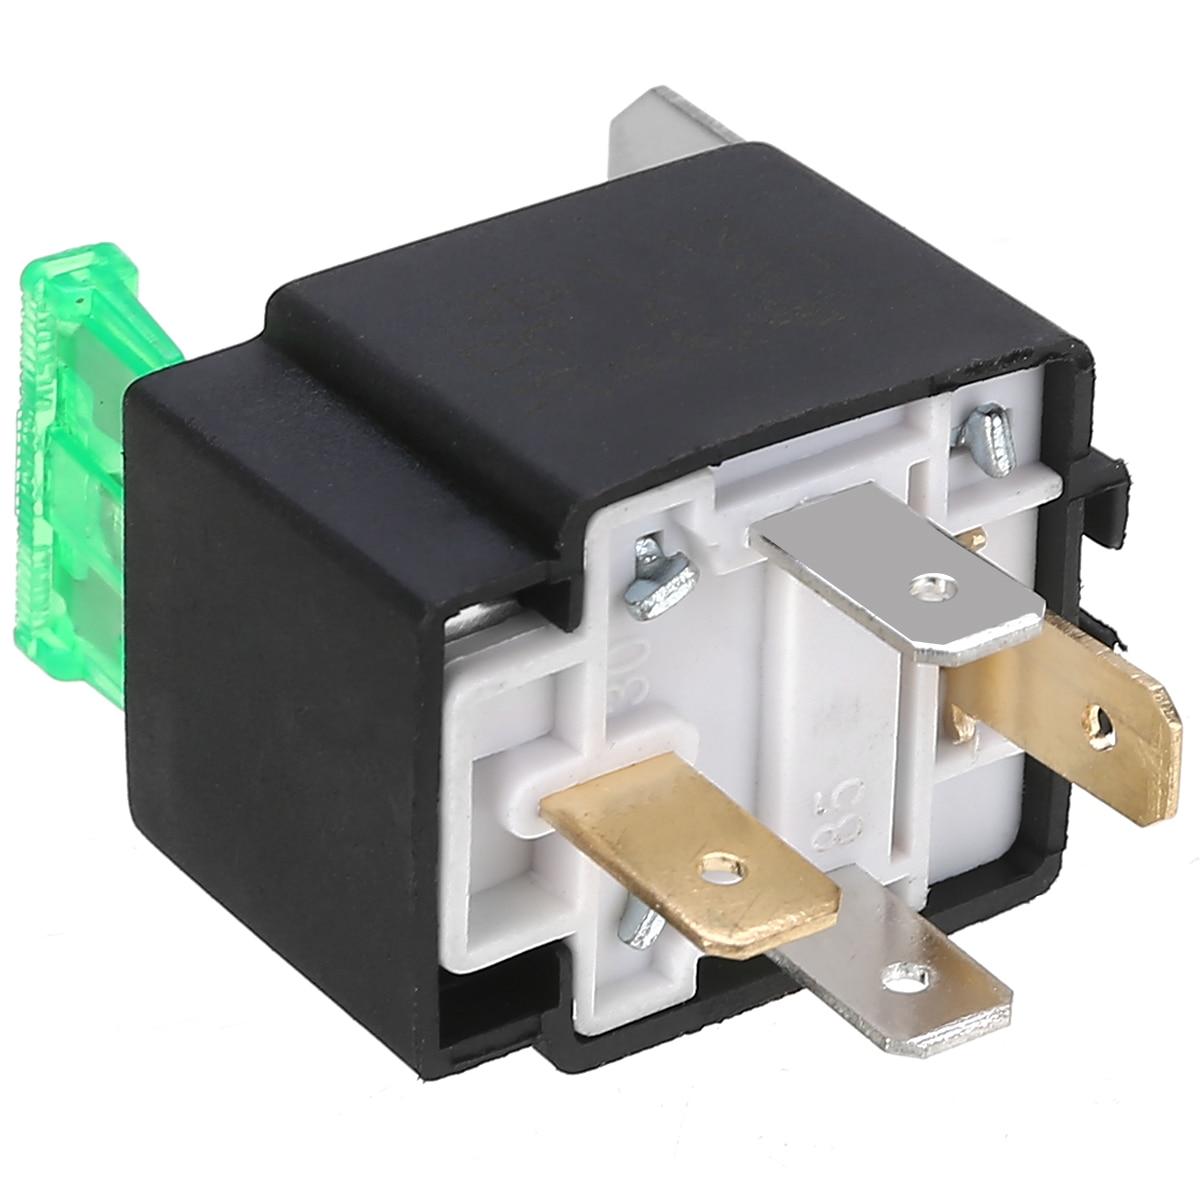 Mayitr, 1 pieza, relé de 12 V, 4 pines, para automóvil, profesional, 30 Amp, RY28, contacto normalmente abierto + fusible de 30 a para piezas interiores de coche